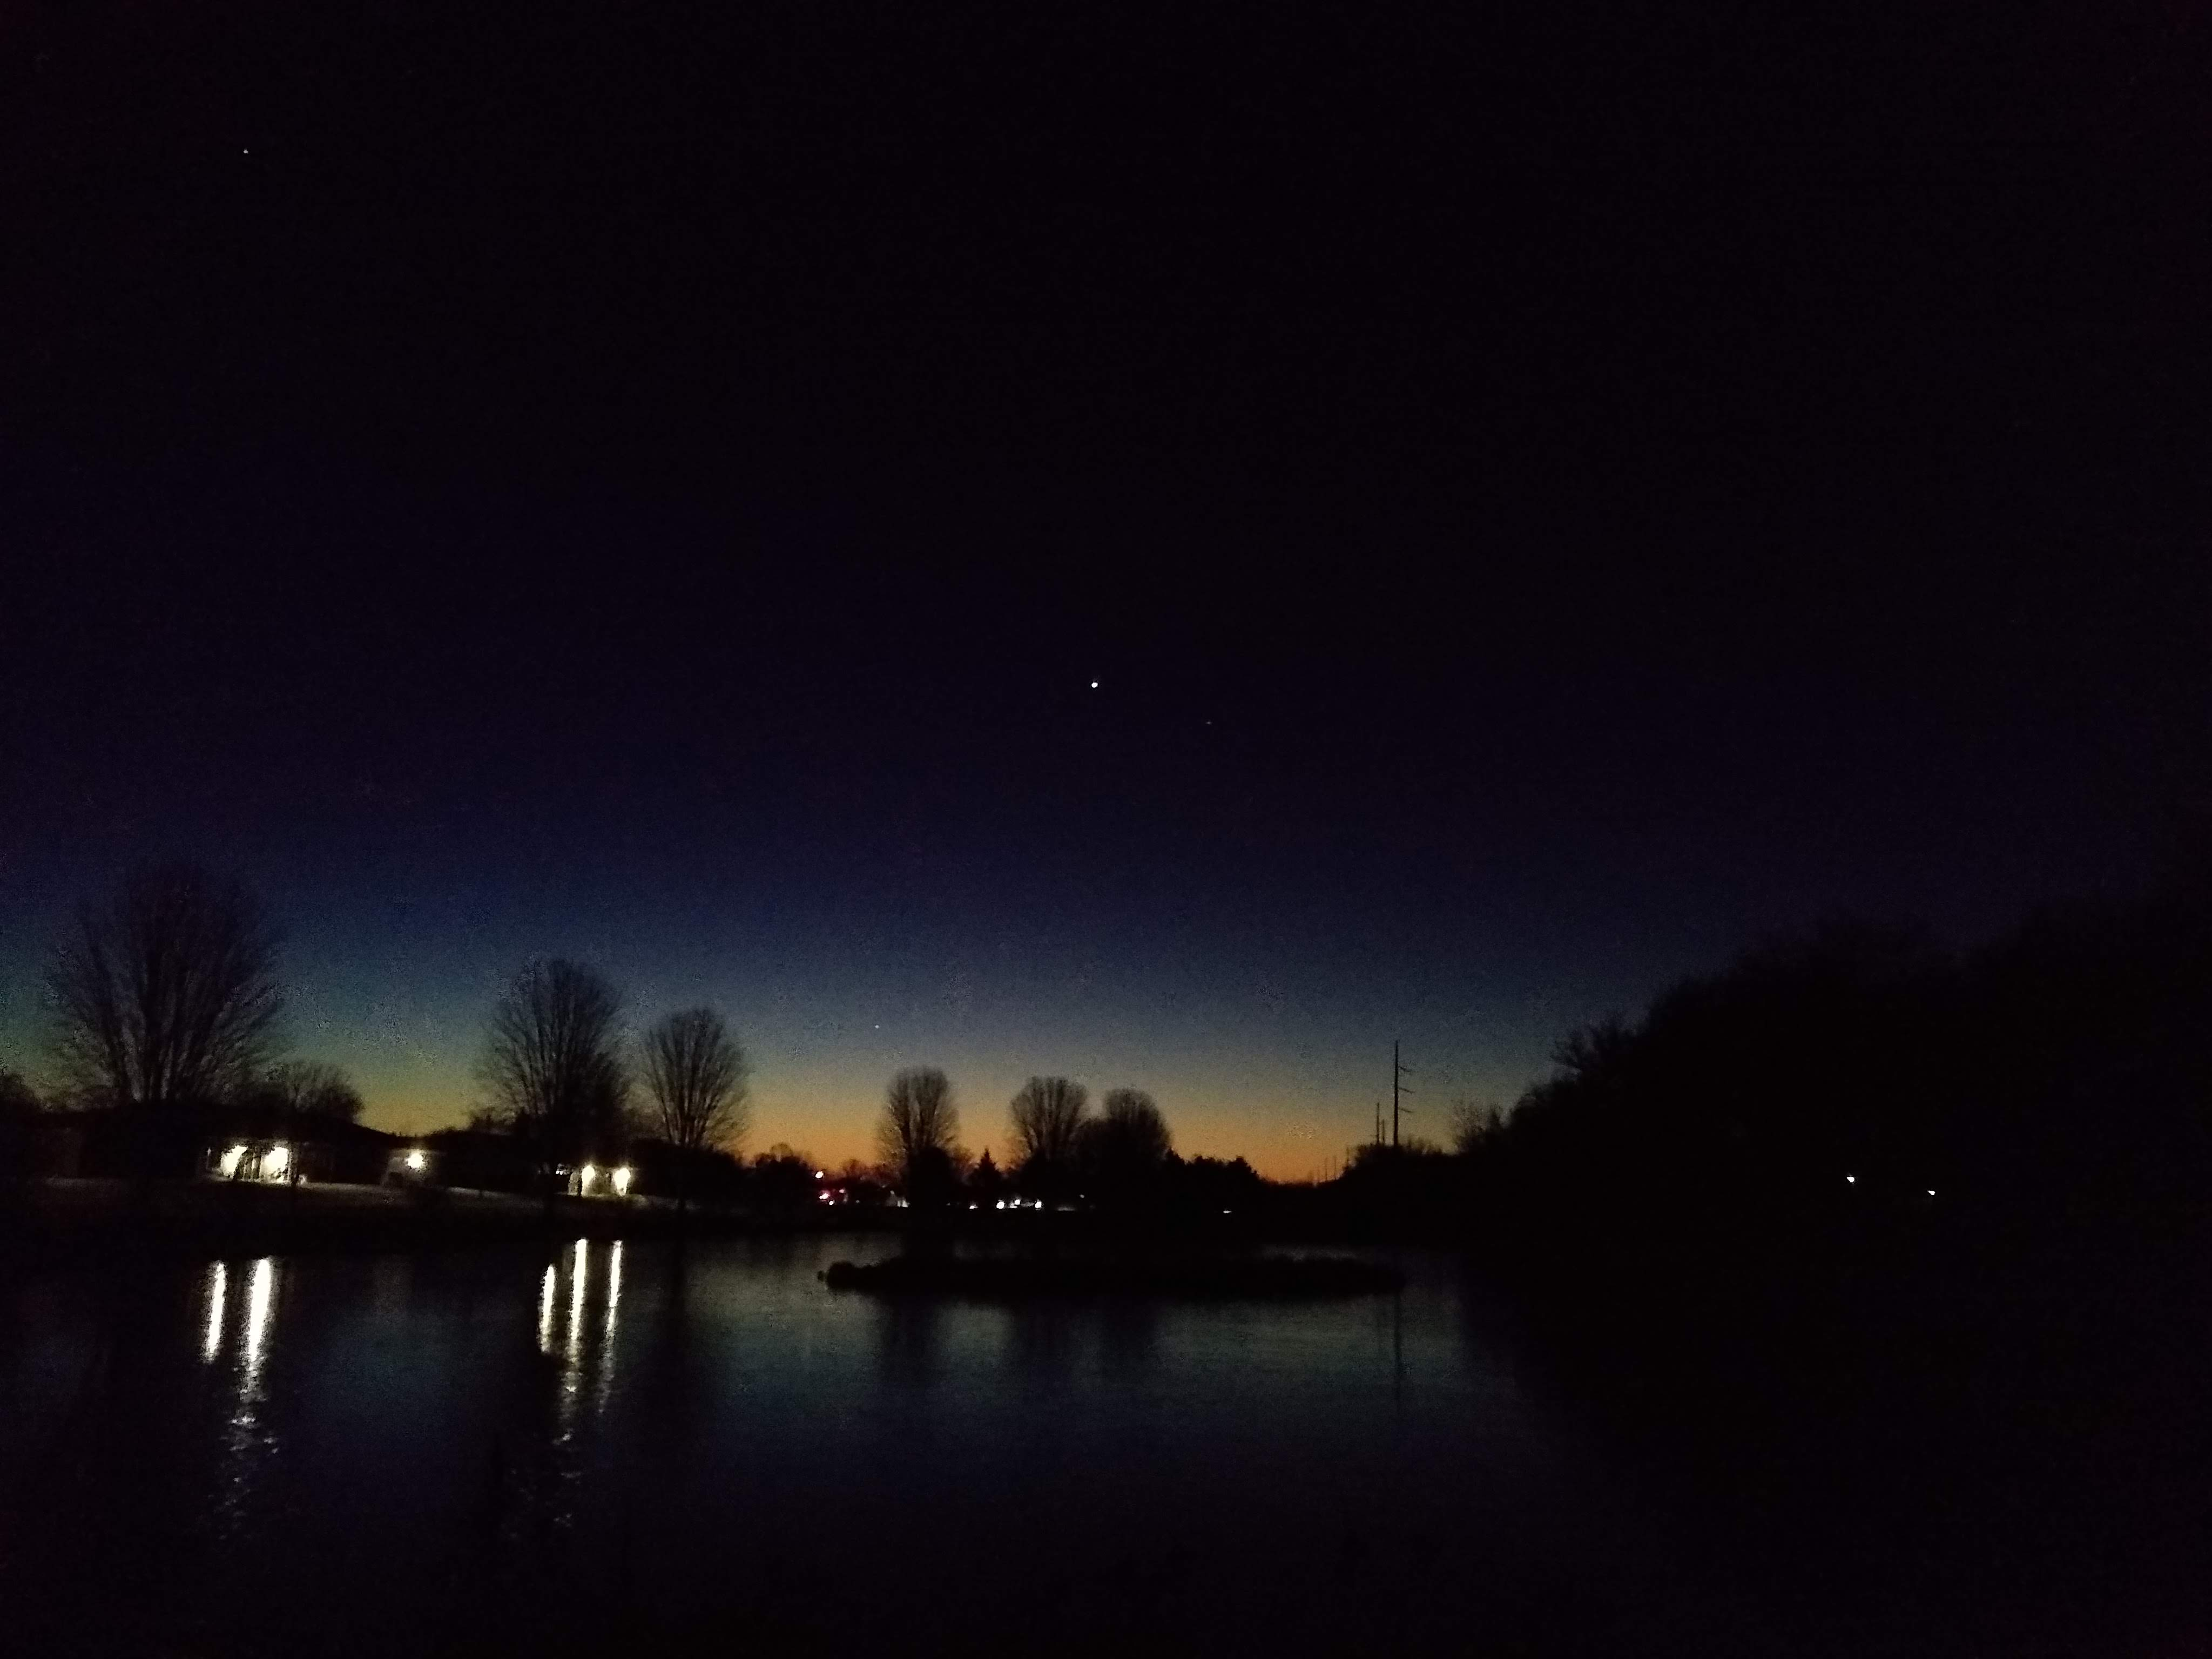 Mercury low on morning horizon 11/17 6:08 AM